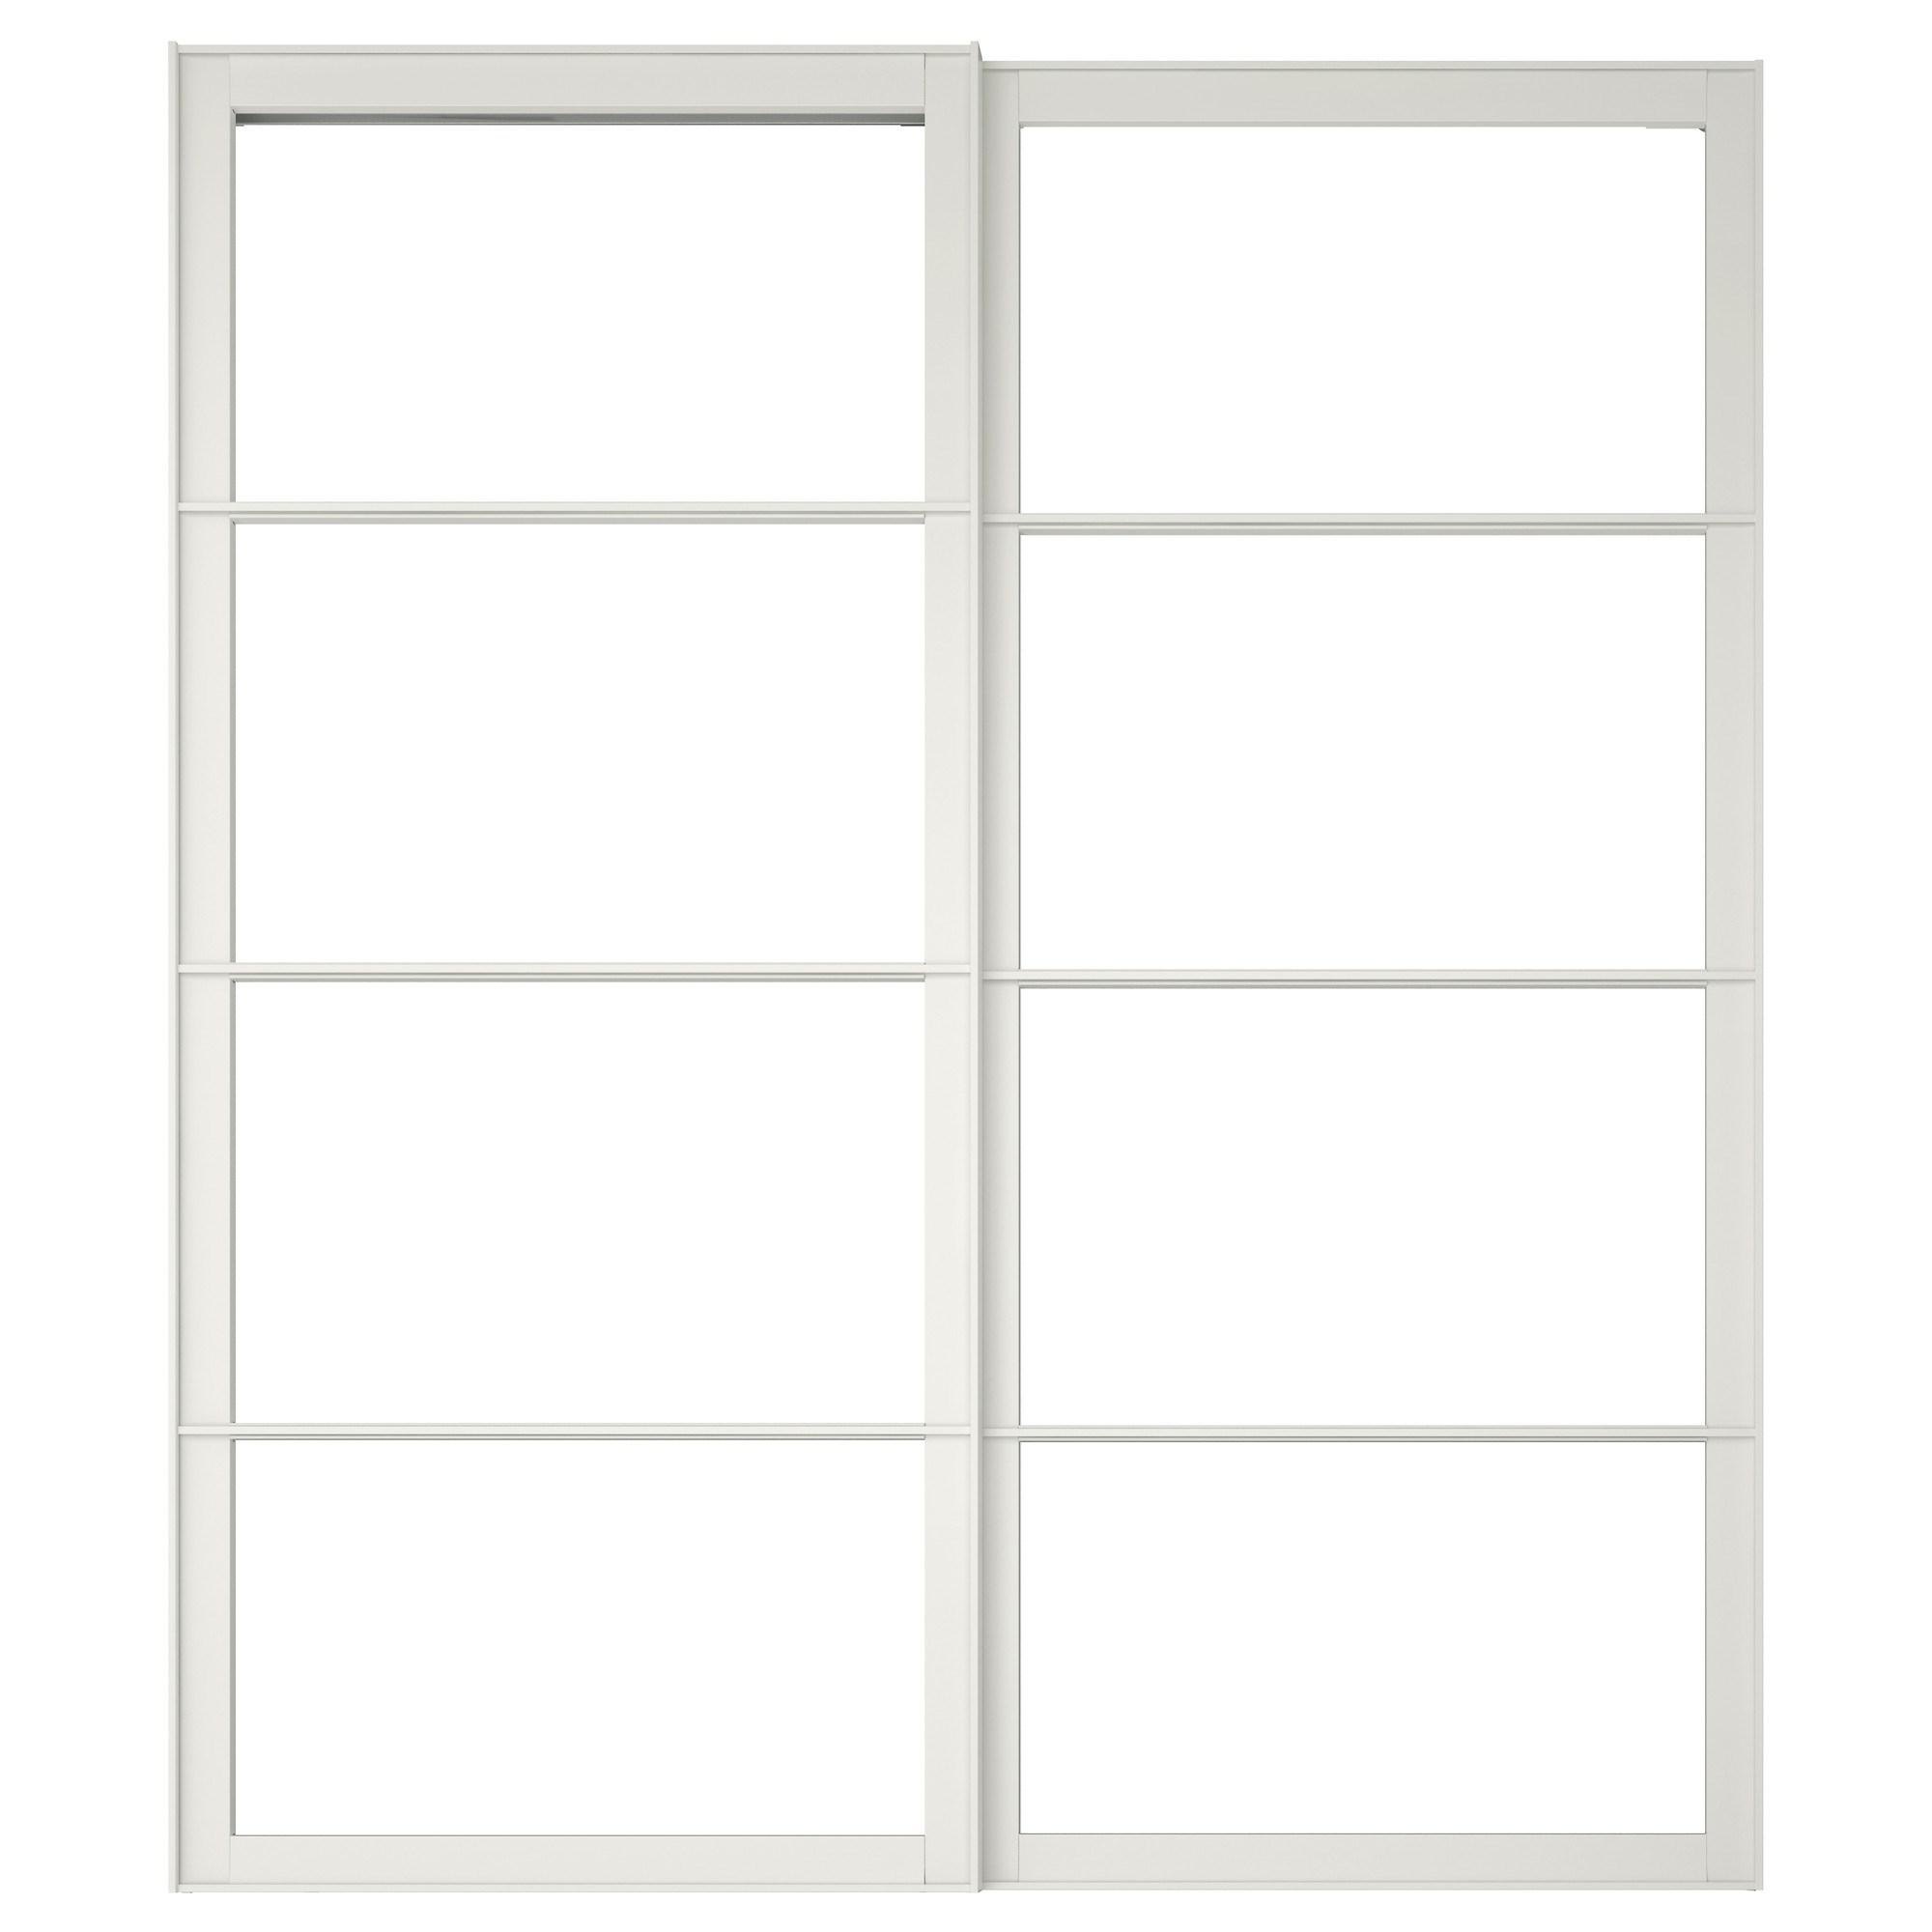 PAX pair of sliding door frames white 200x236 cm | IKEA Bedroom